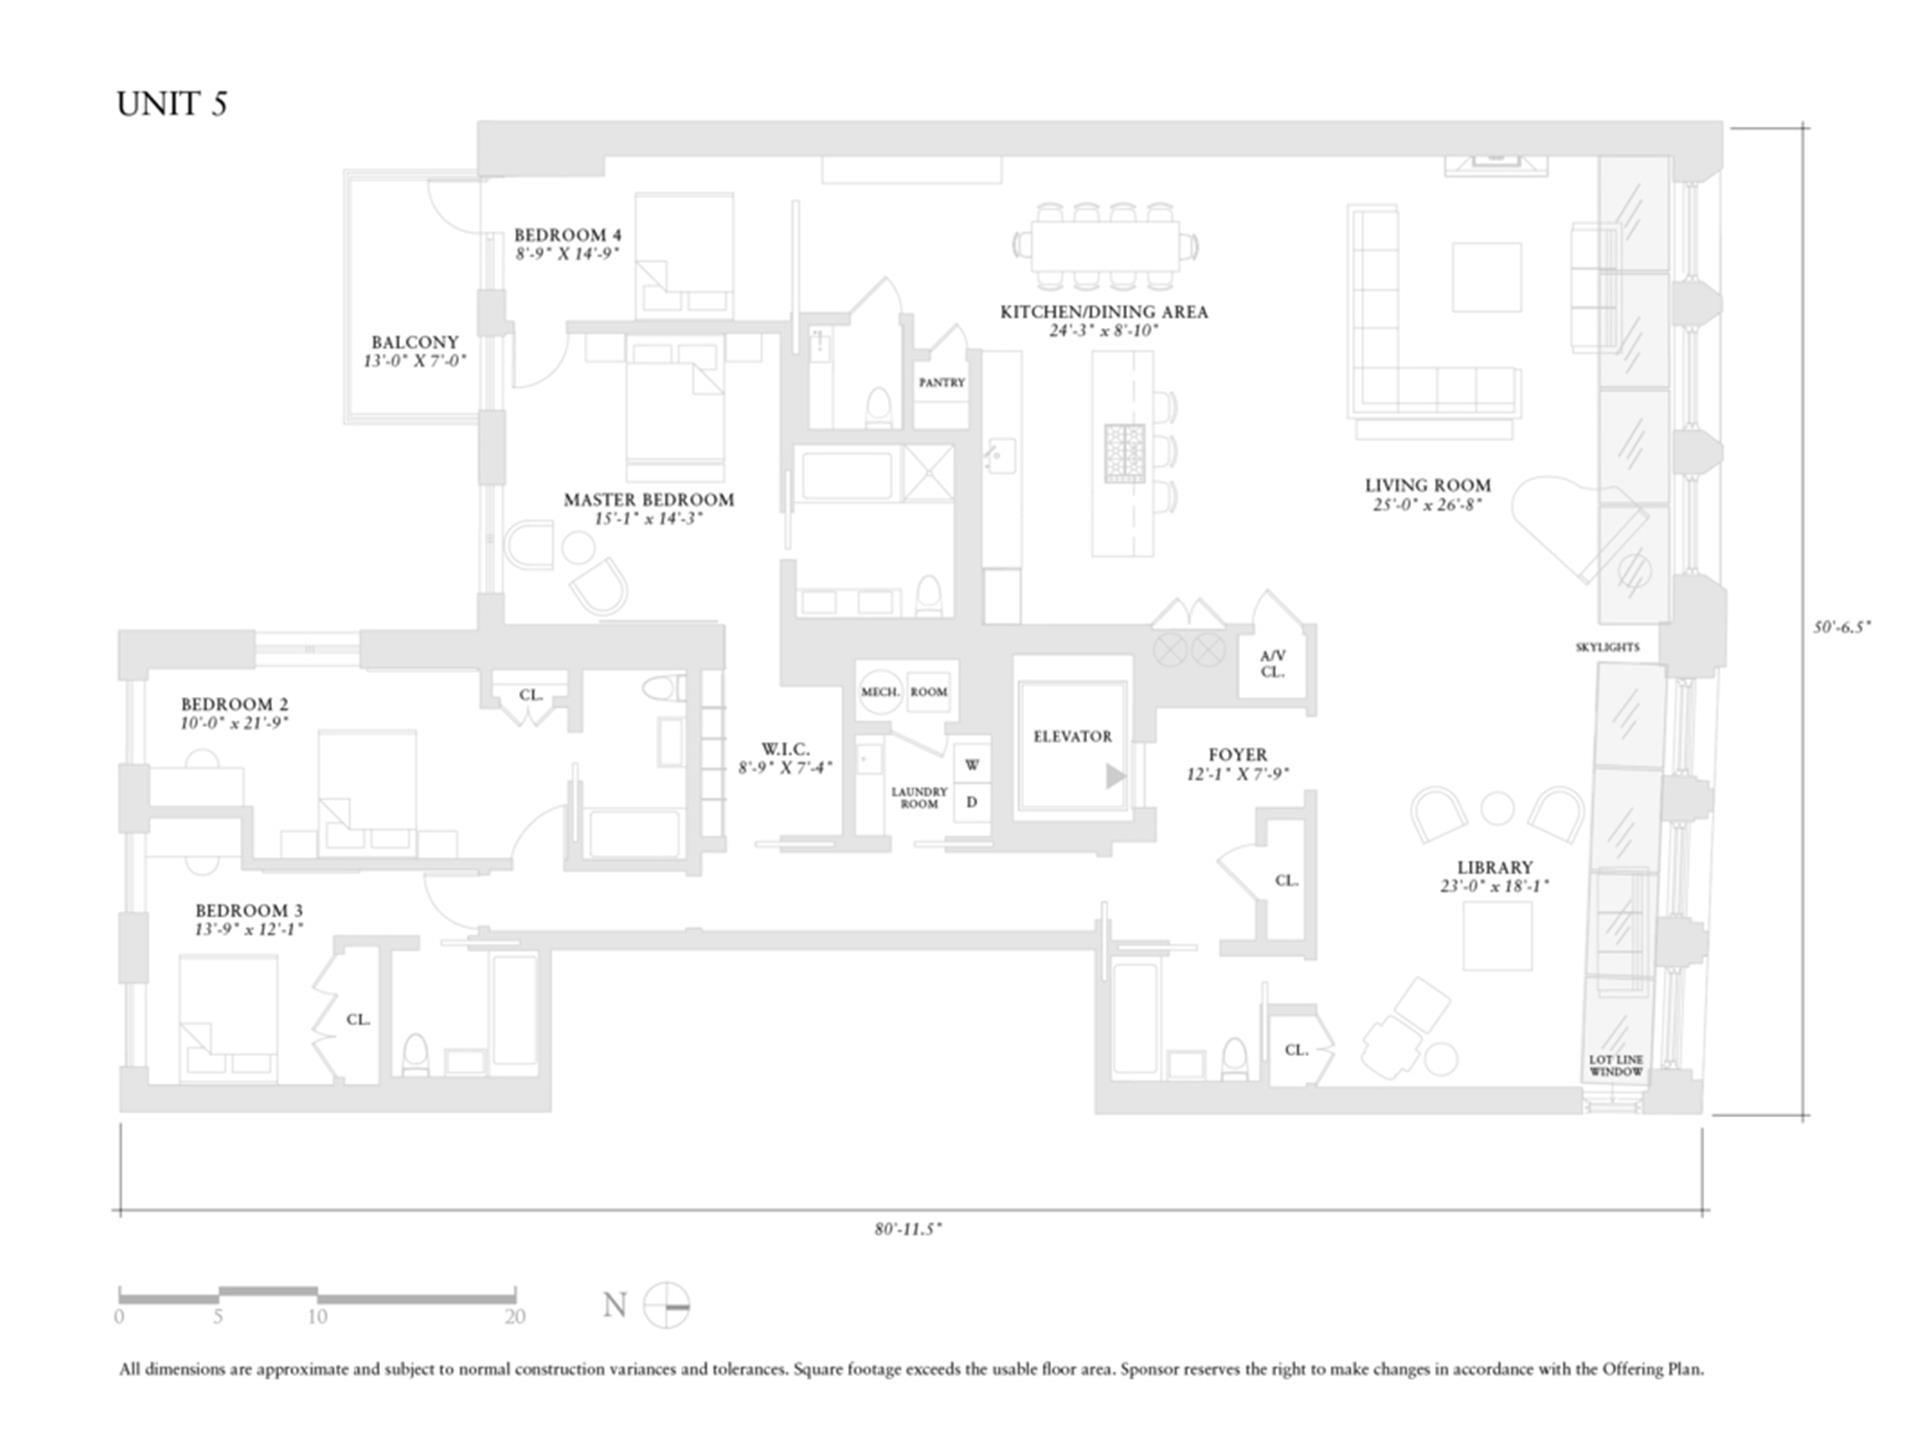 Floor plan of 52 Lispenard St, 5 - TriBeCa, New York